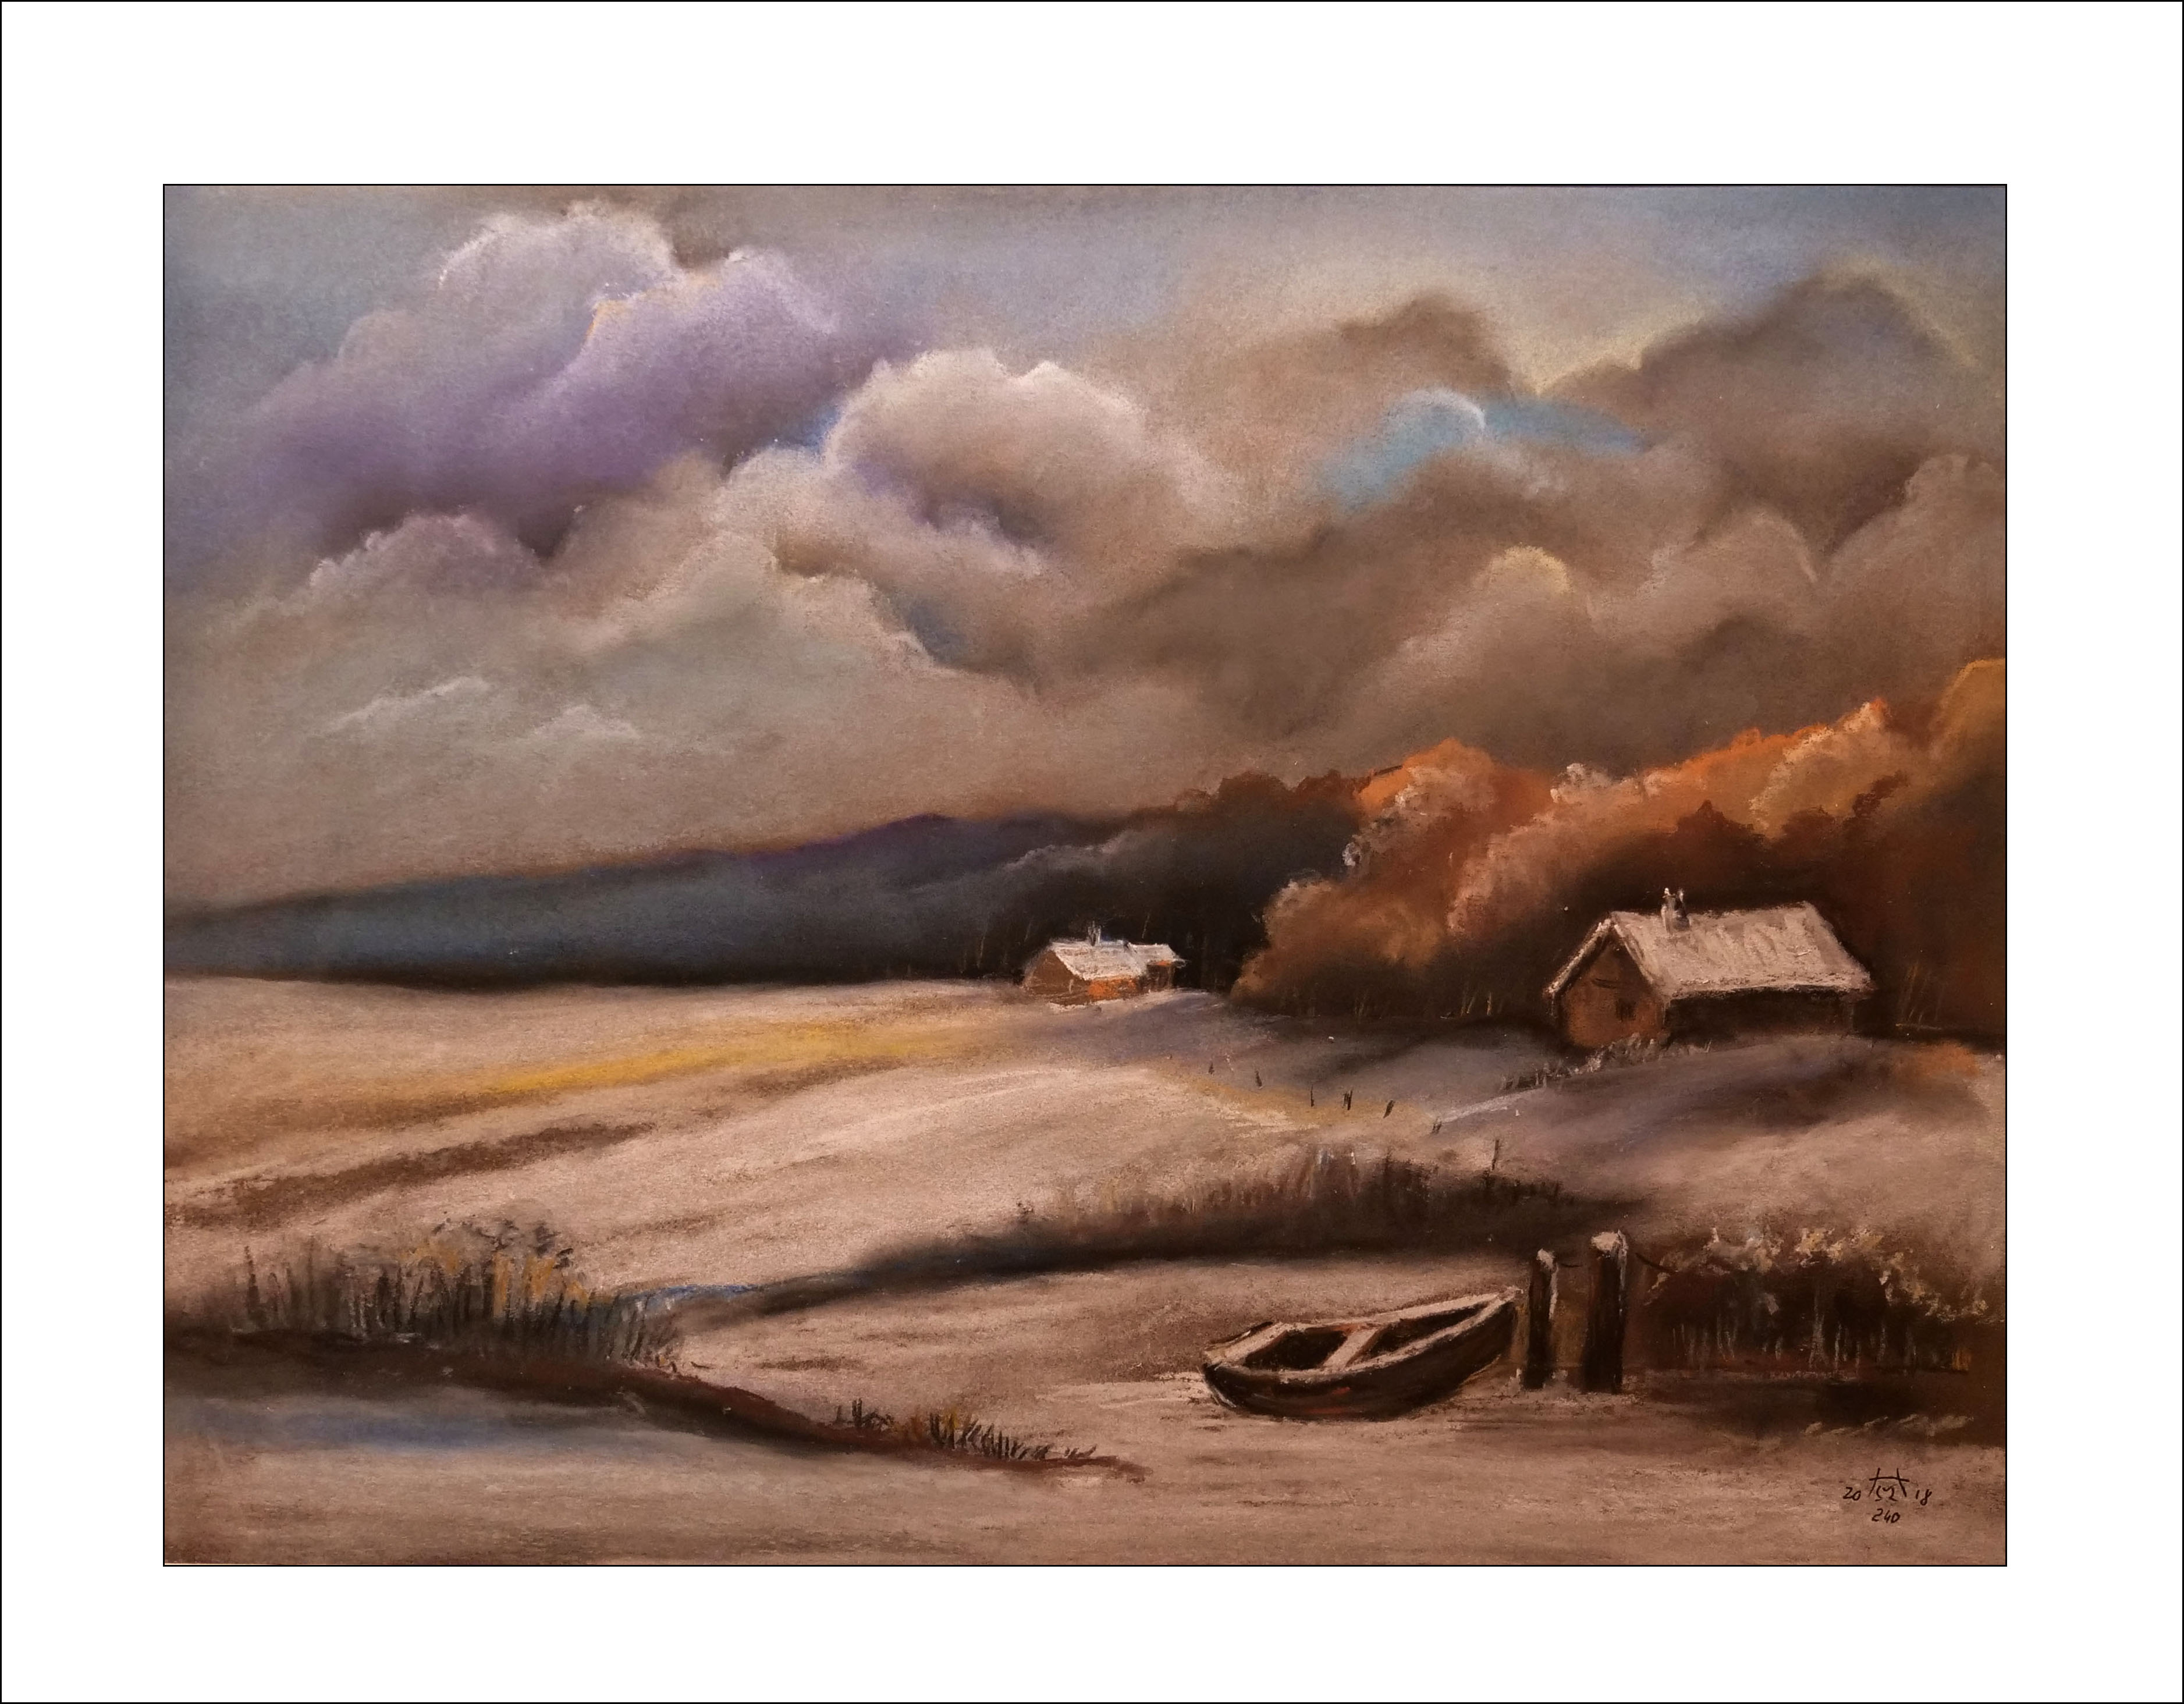 Nr. 241 Winterruhe40 x 50 cm  (Nr. 241)